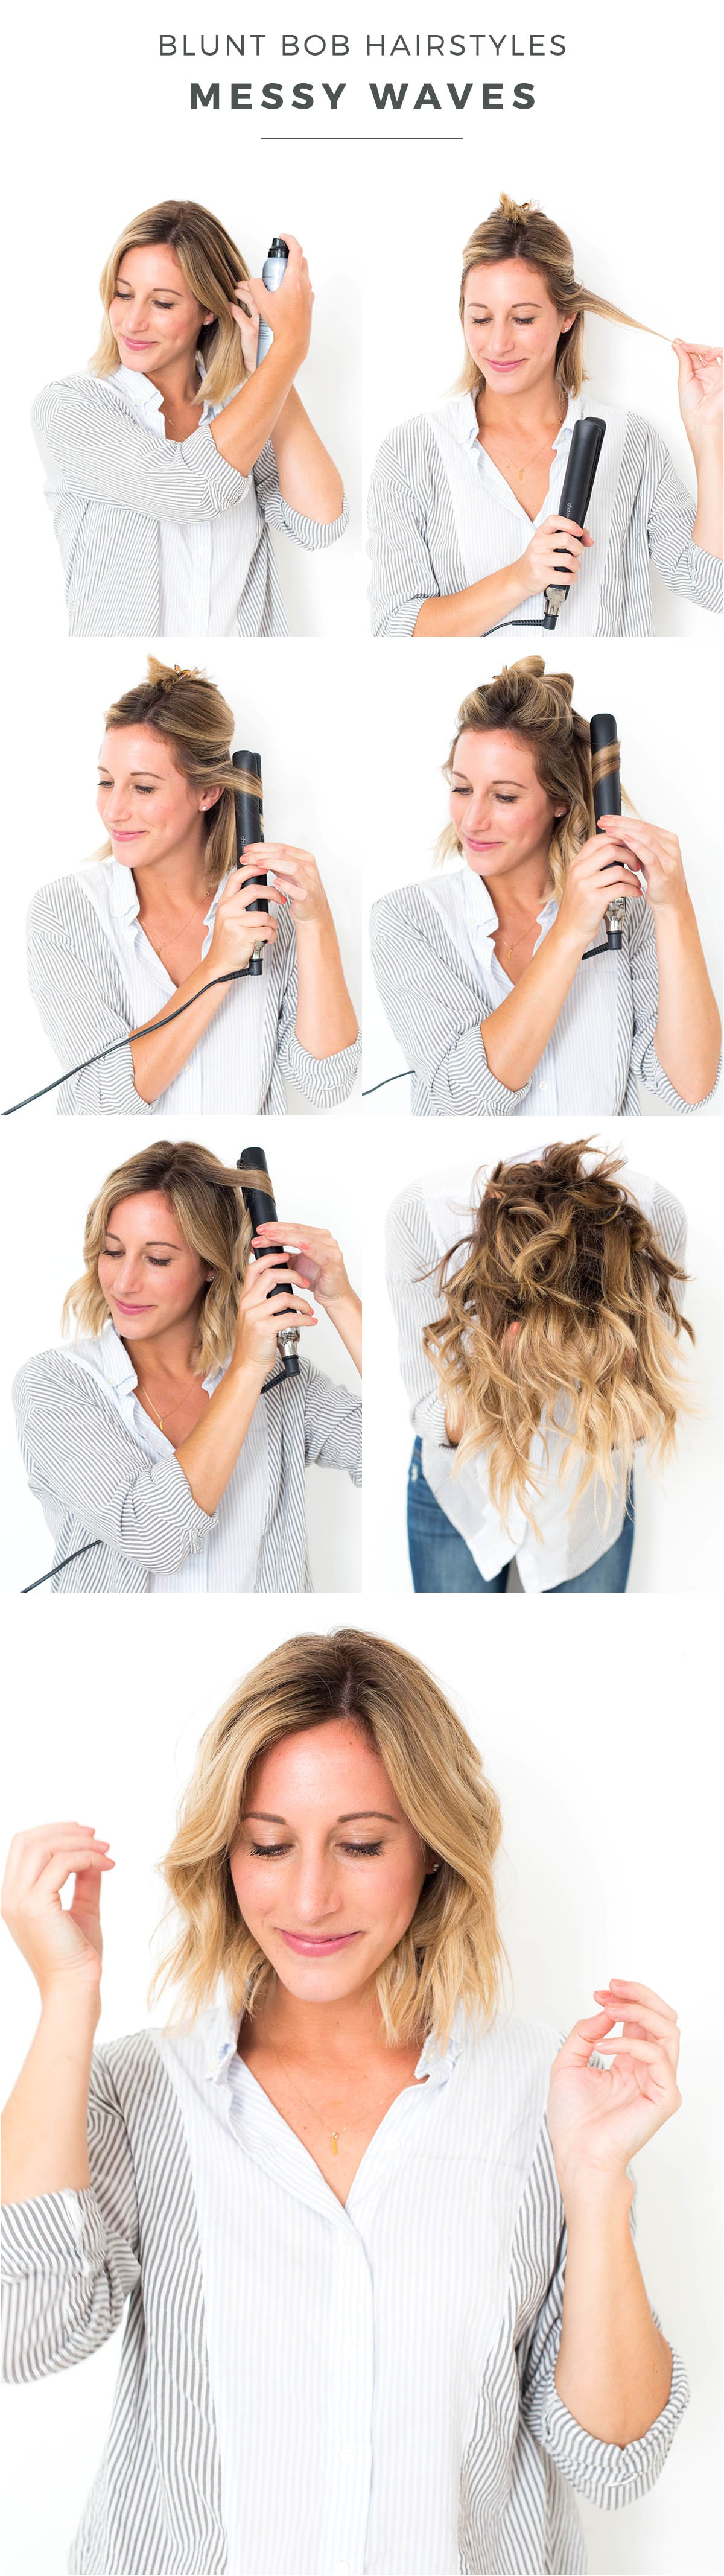 blunt bob hairstyles messy waves